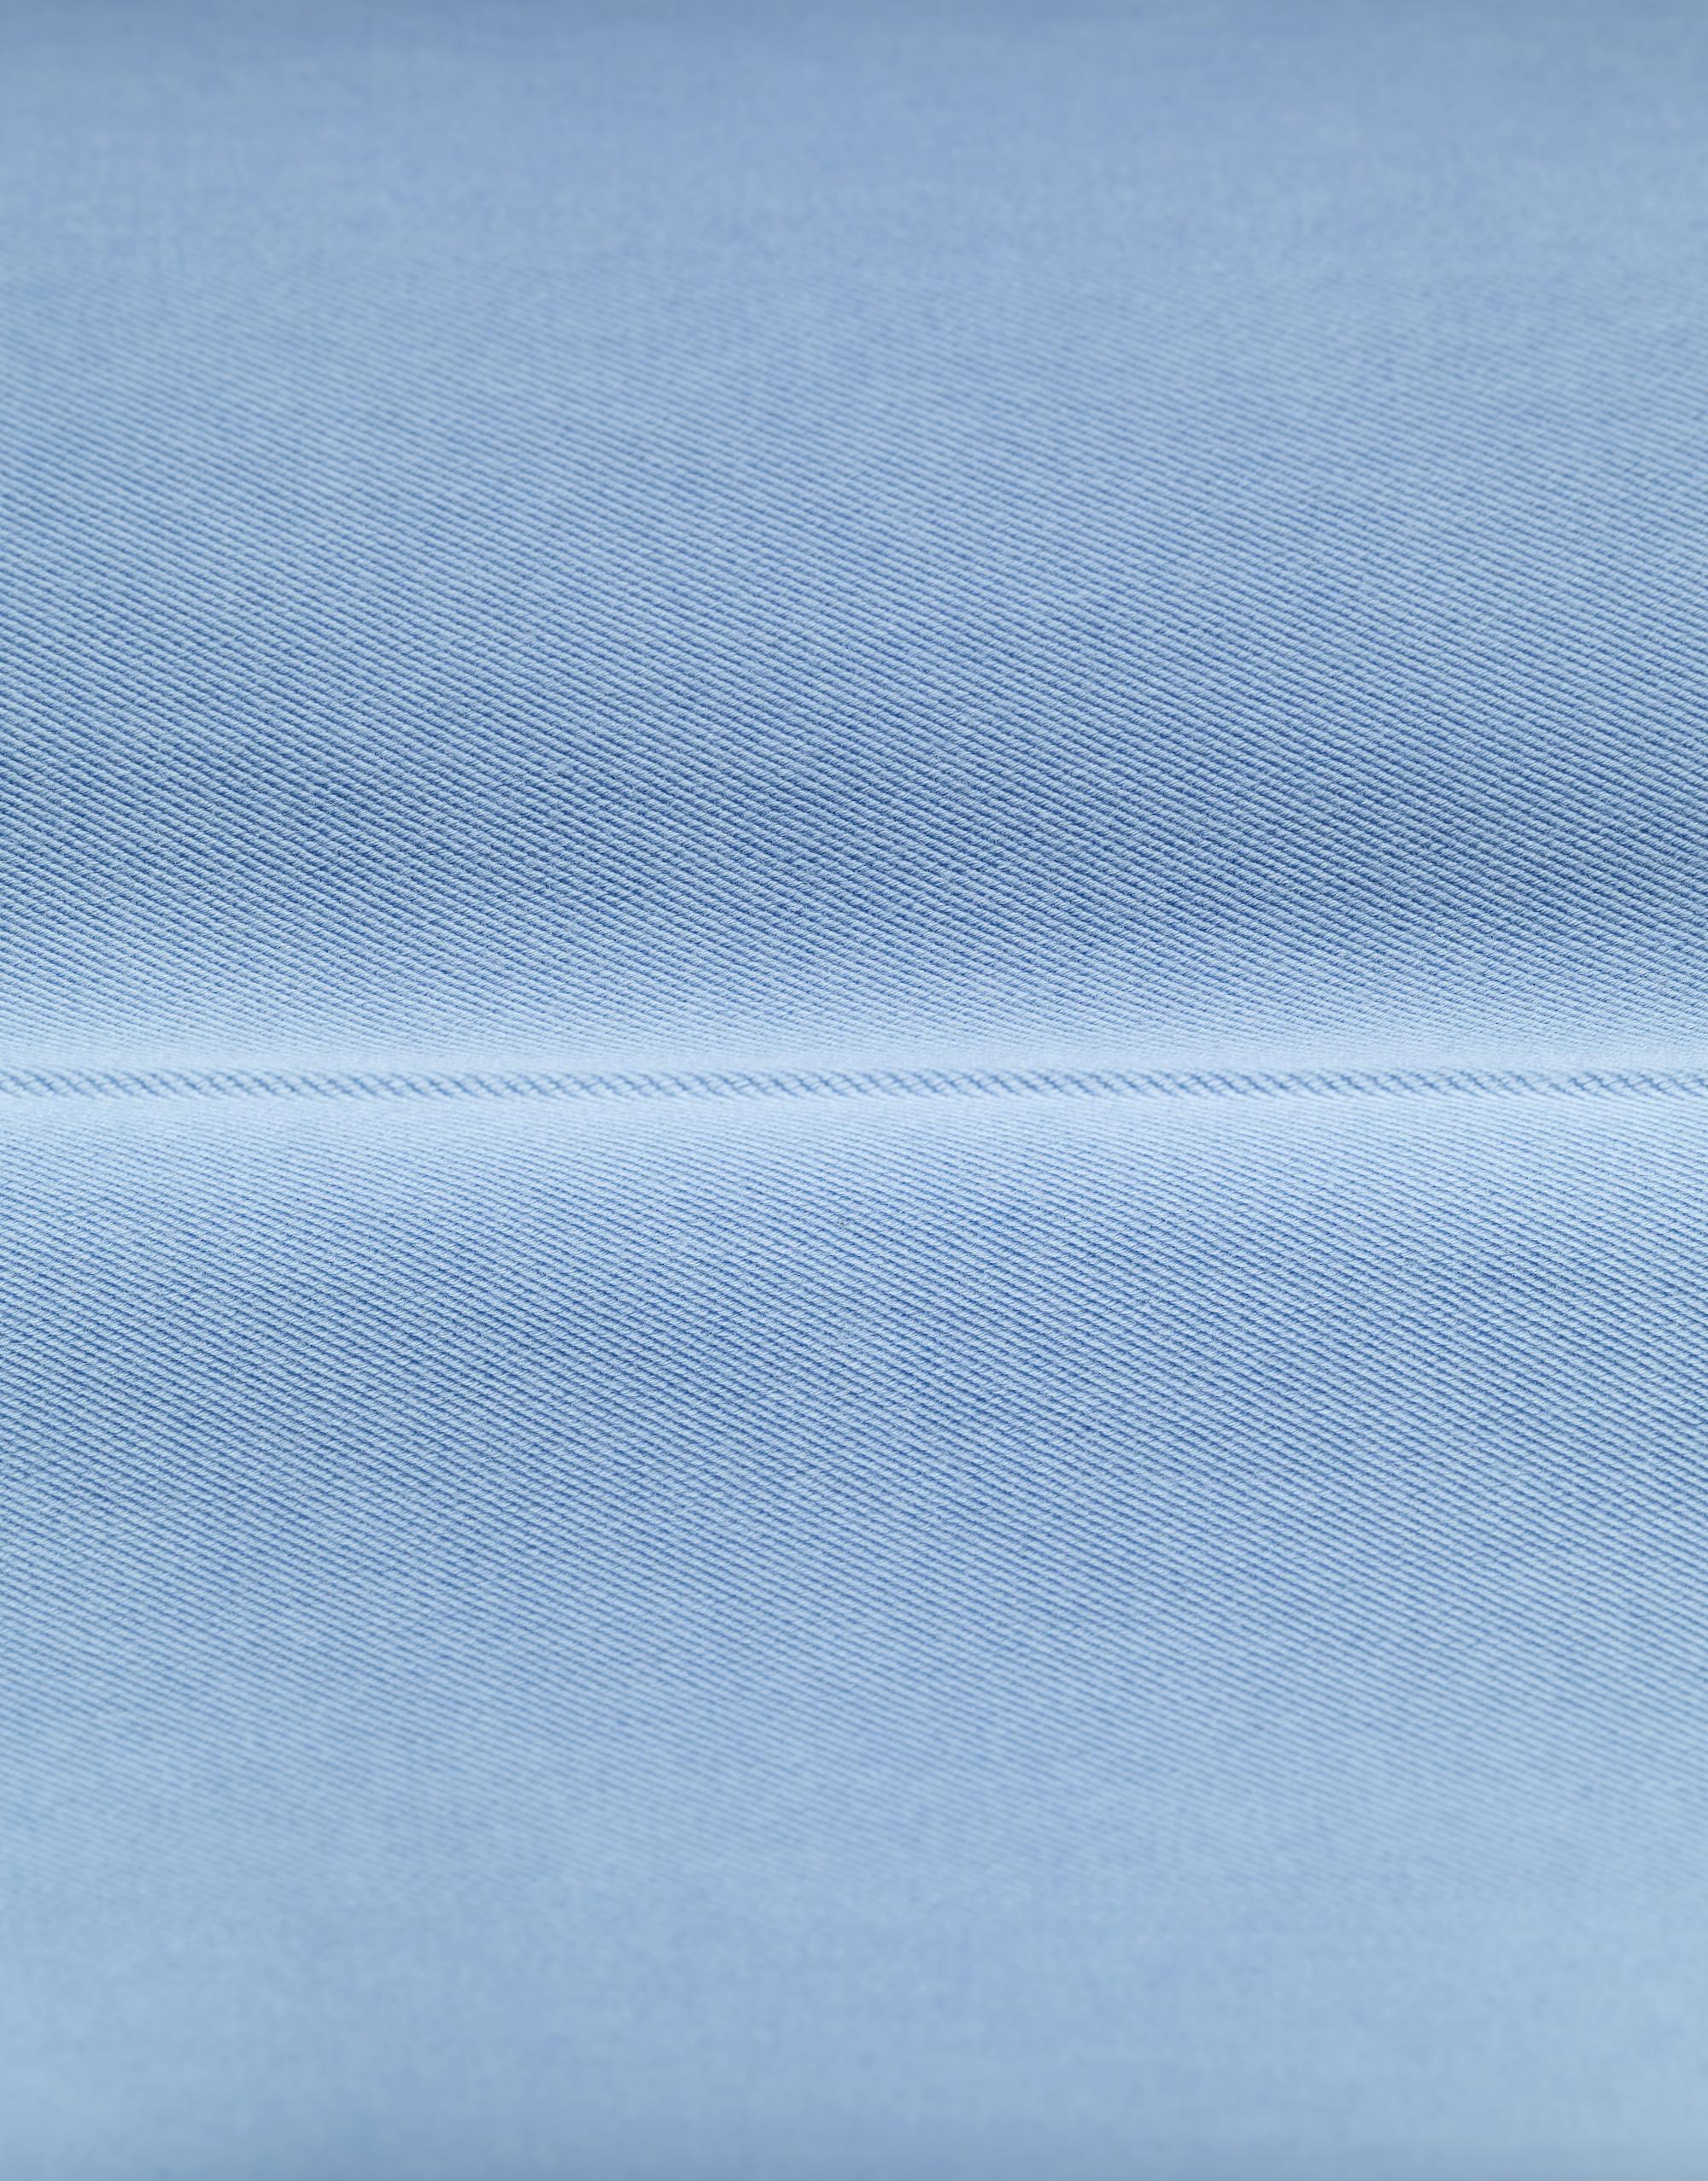 FM blue gucci-pants.2000x0.jpg